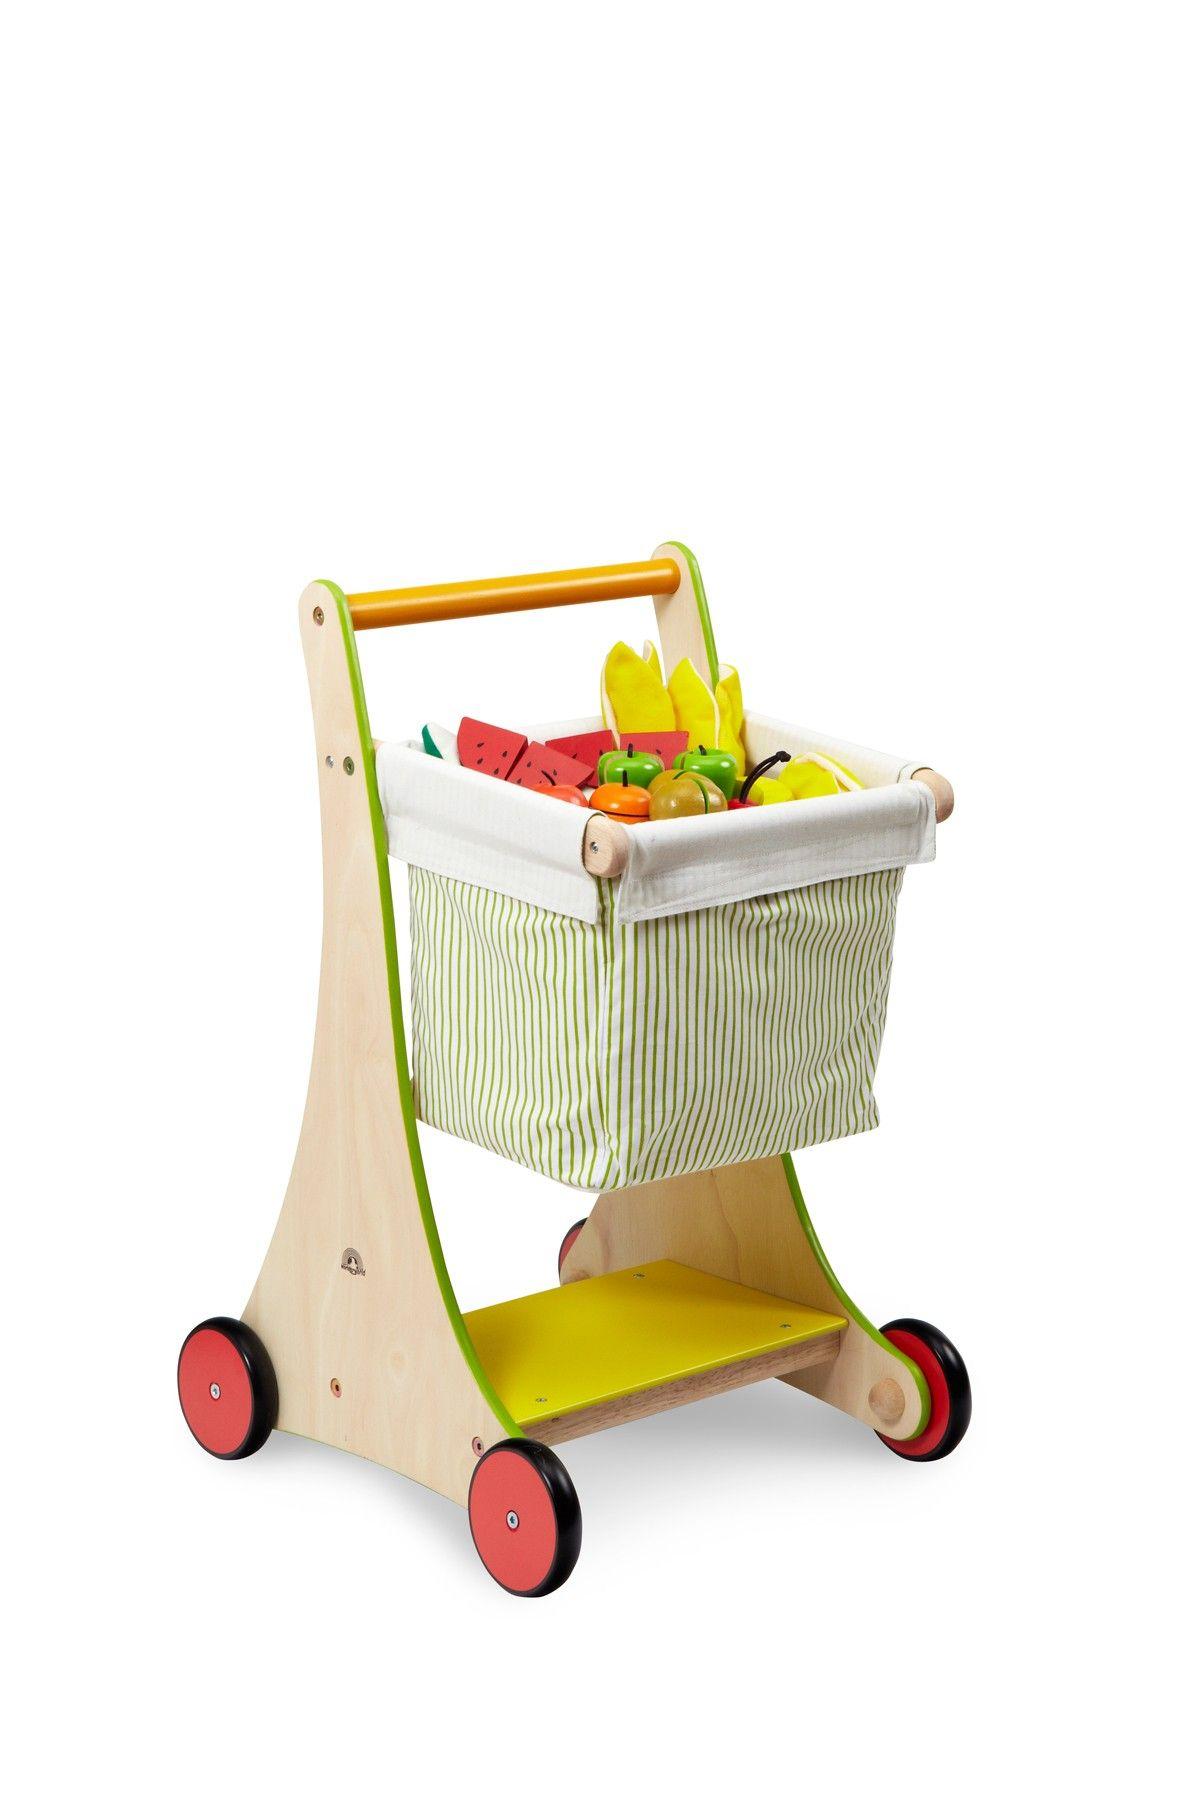 wonderworld wonder shopping cart toys toys toy kitchen kids toys. Black Bedroom Furniture Sets. Home Design Ideas